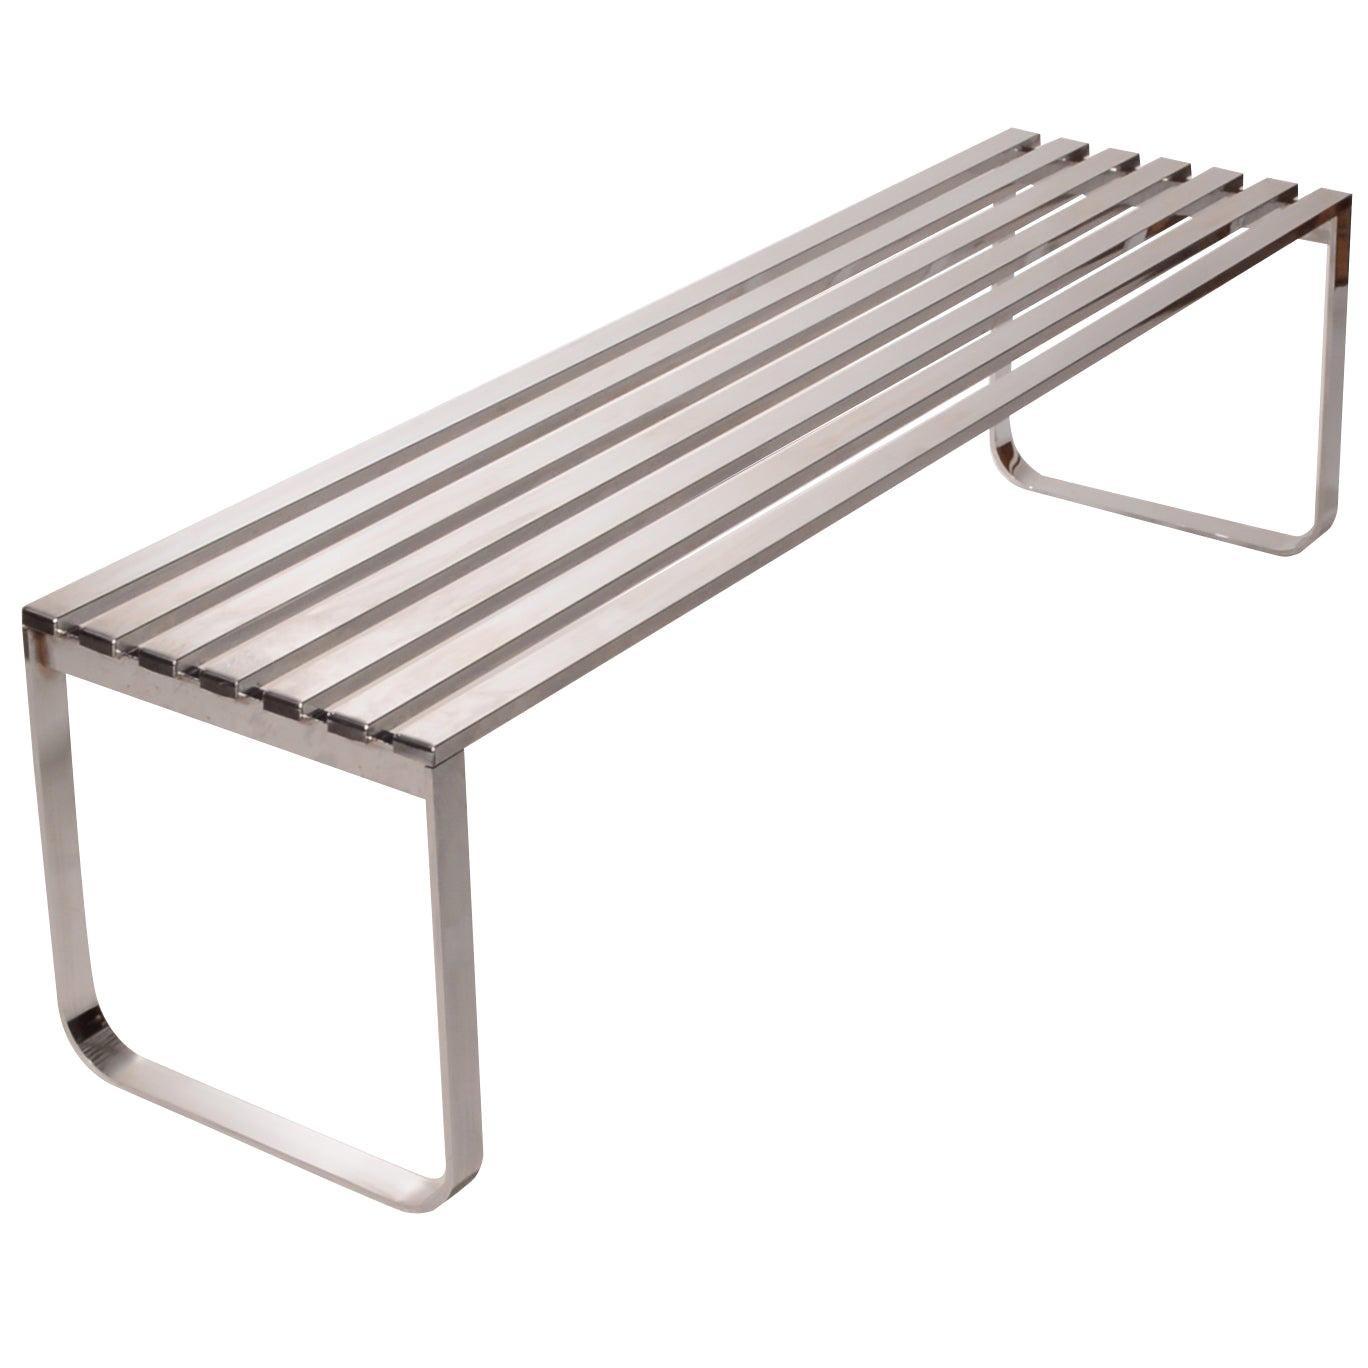 Design Institute of America Chrome Slat Bench by Milo Baughman